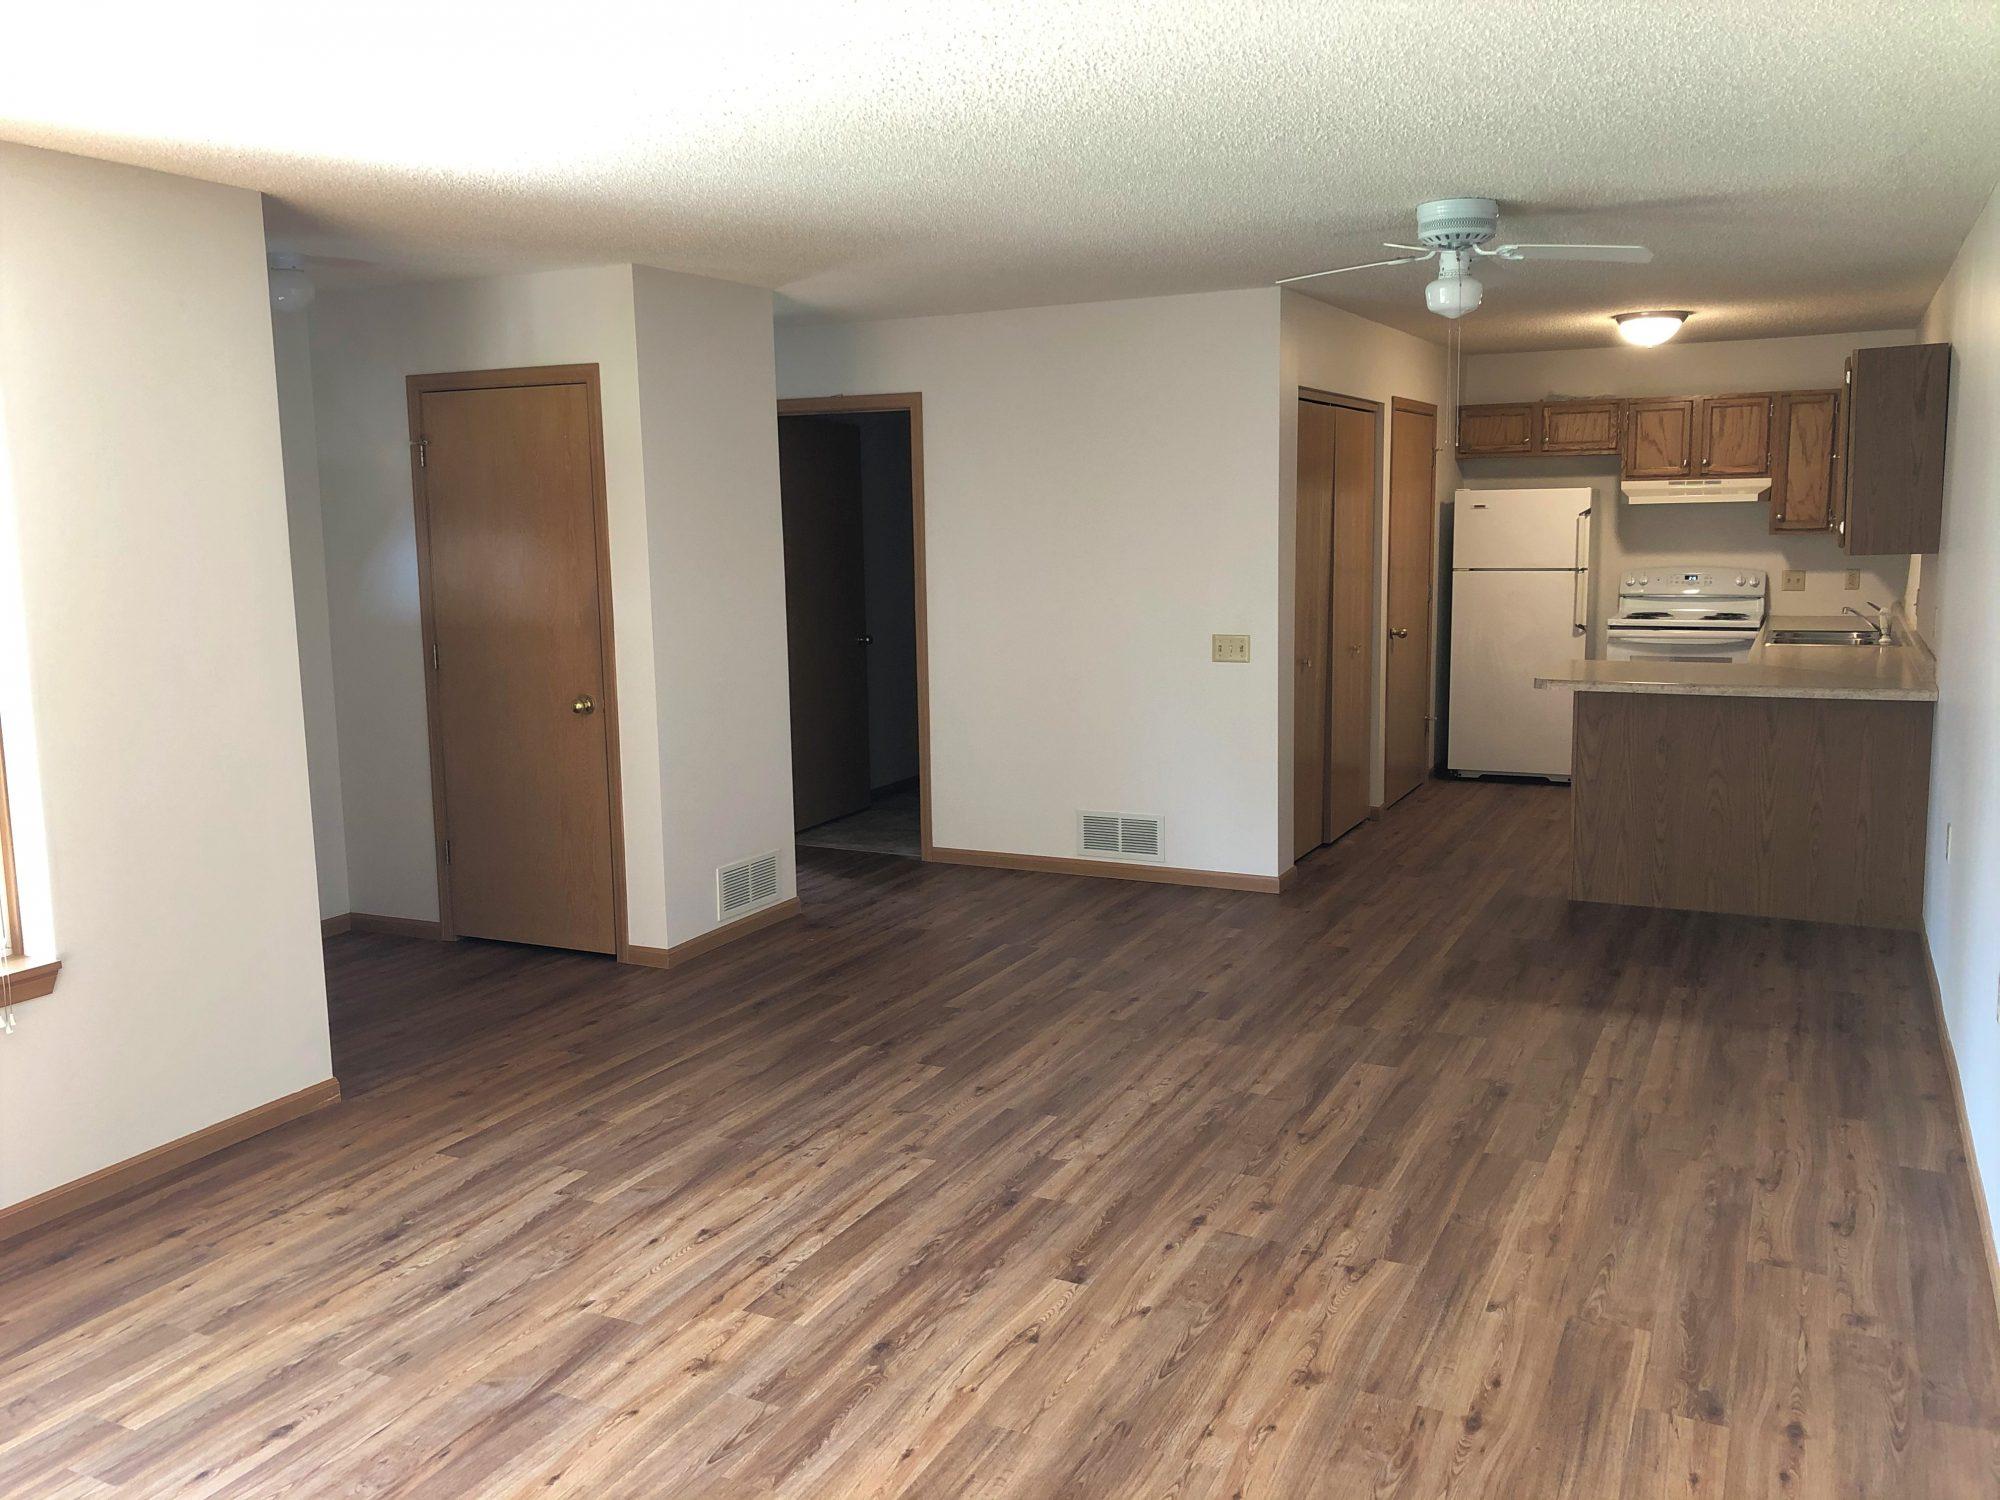 Villas of Caroline living room and kitchen